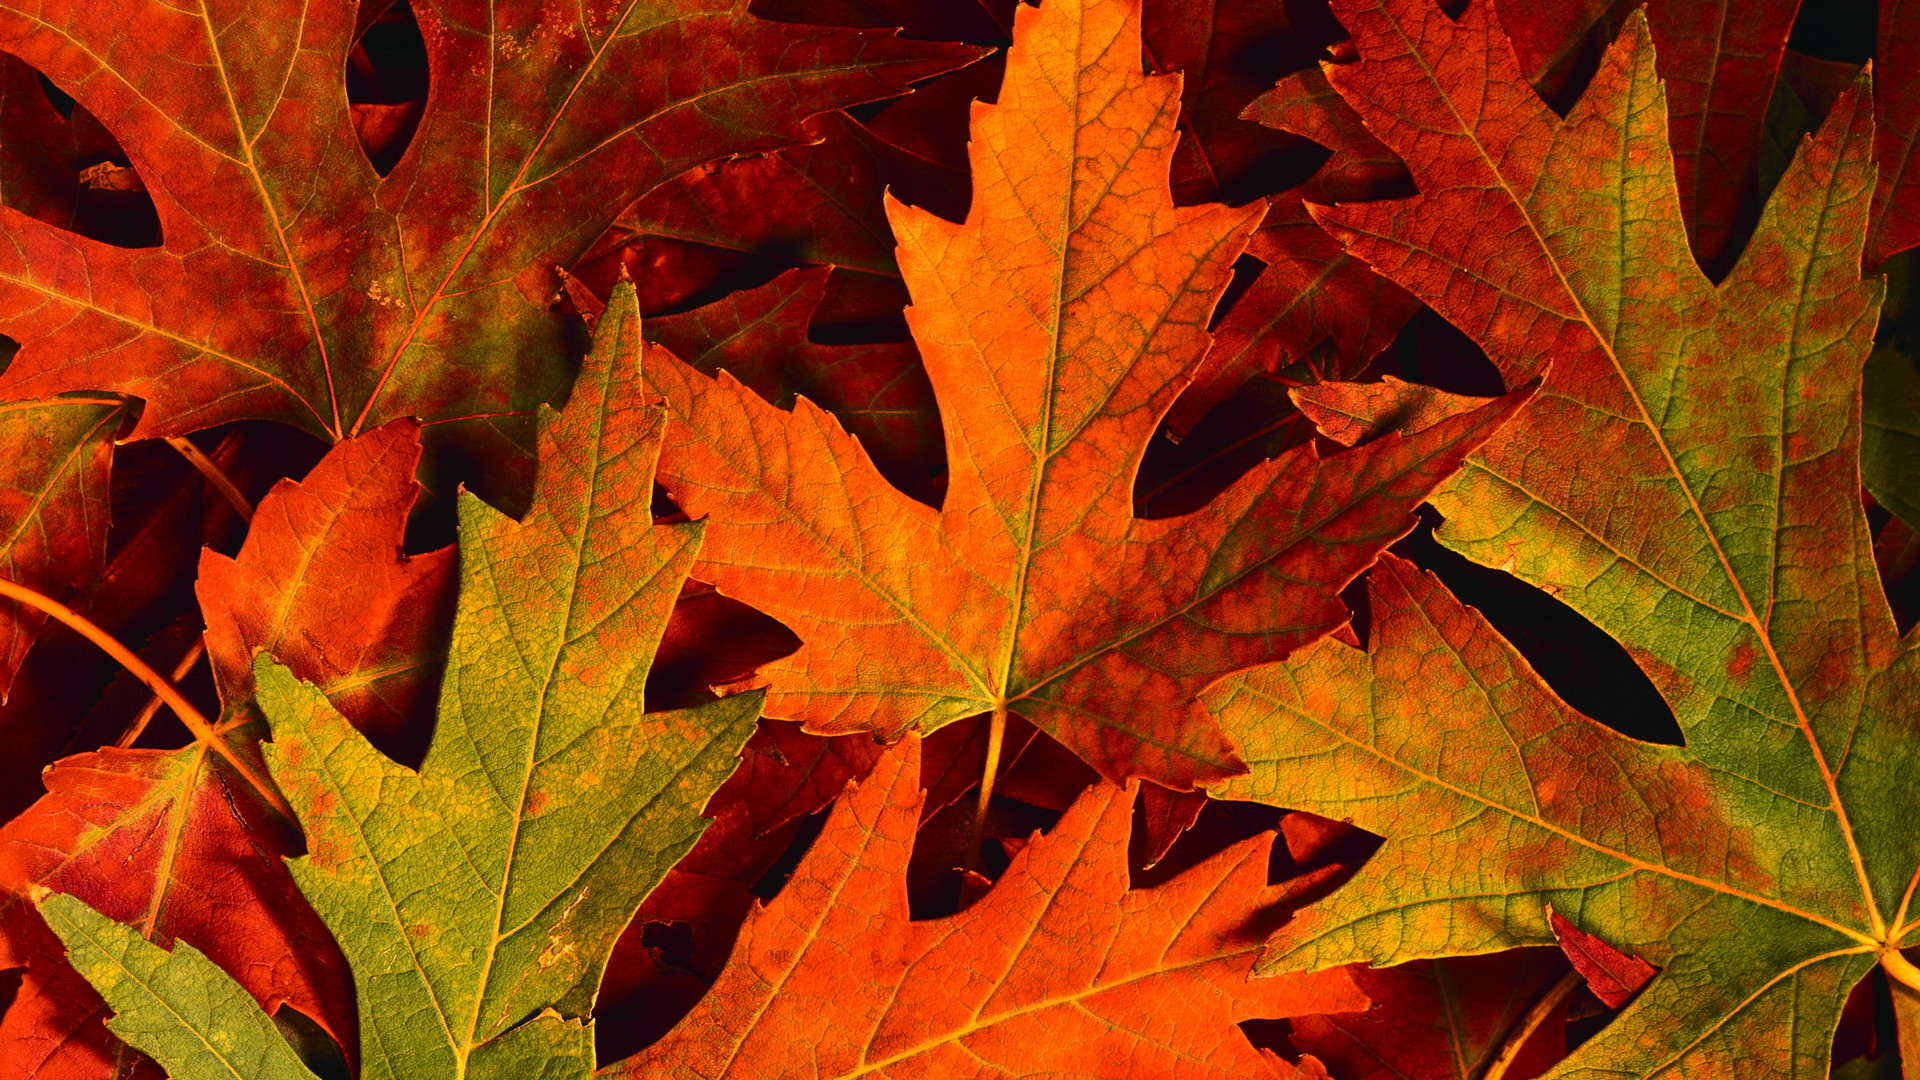 Fall Leaves Desktop Wallpaper (59+ images)